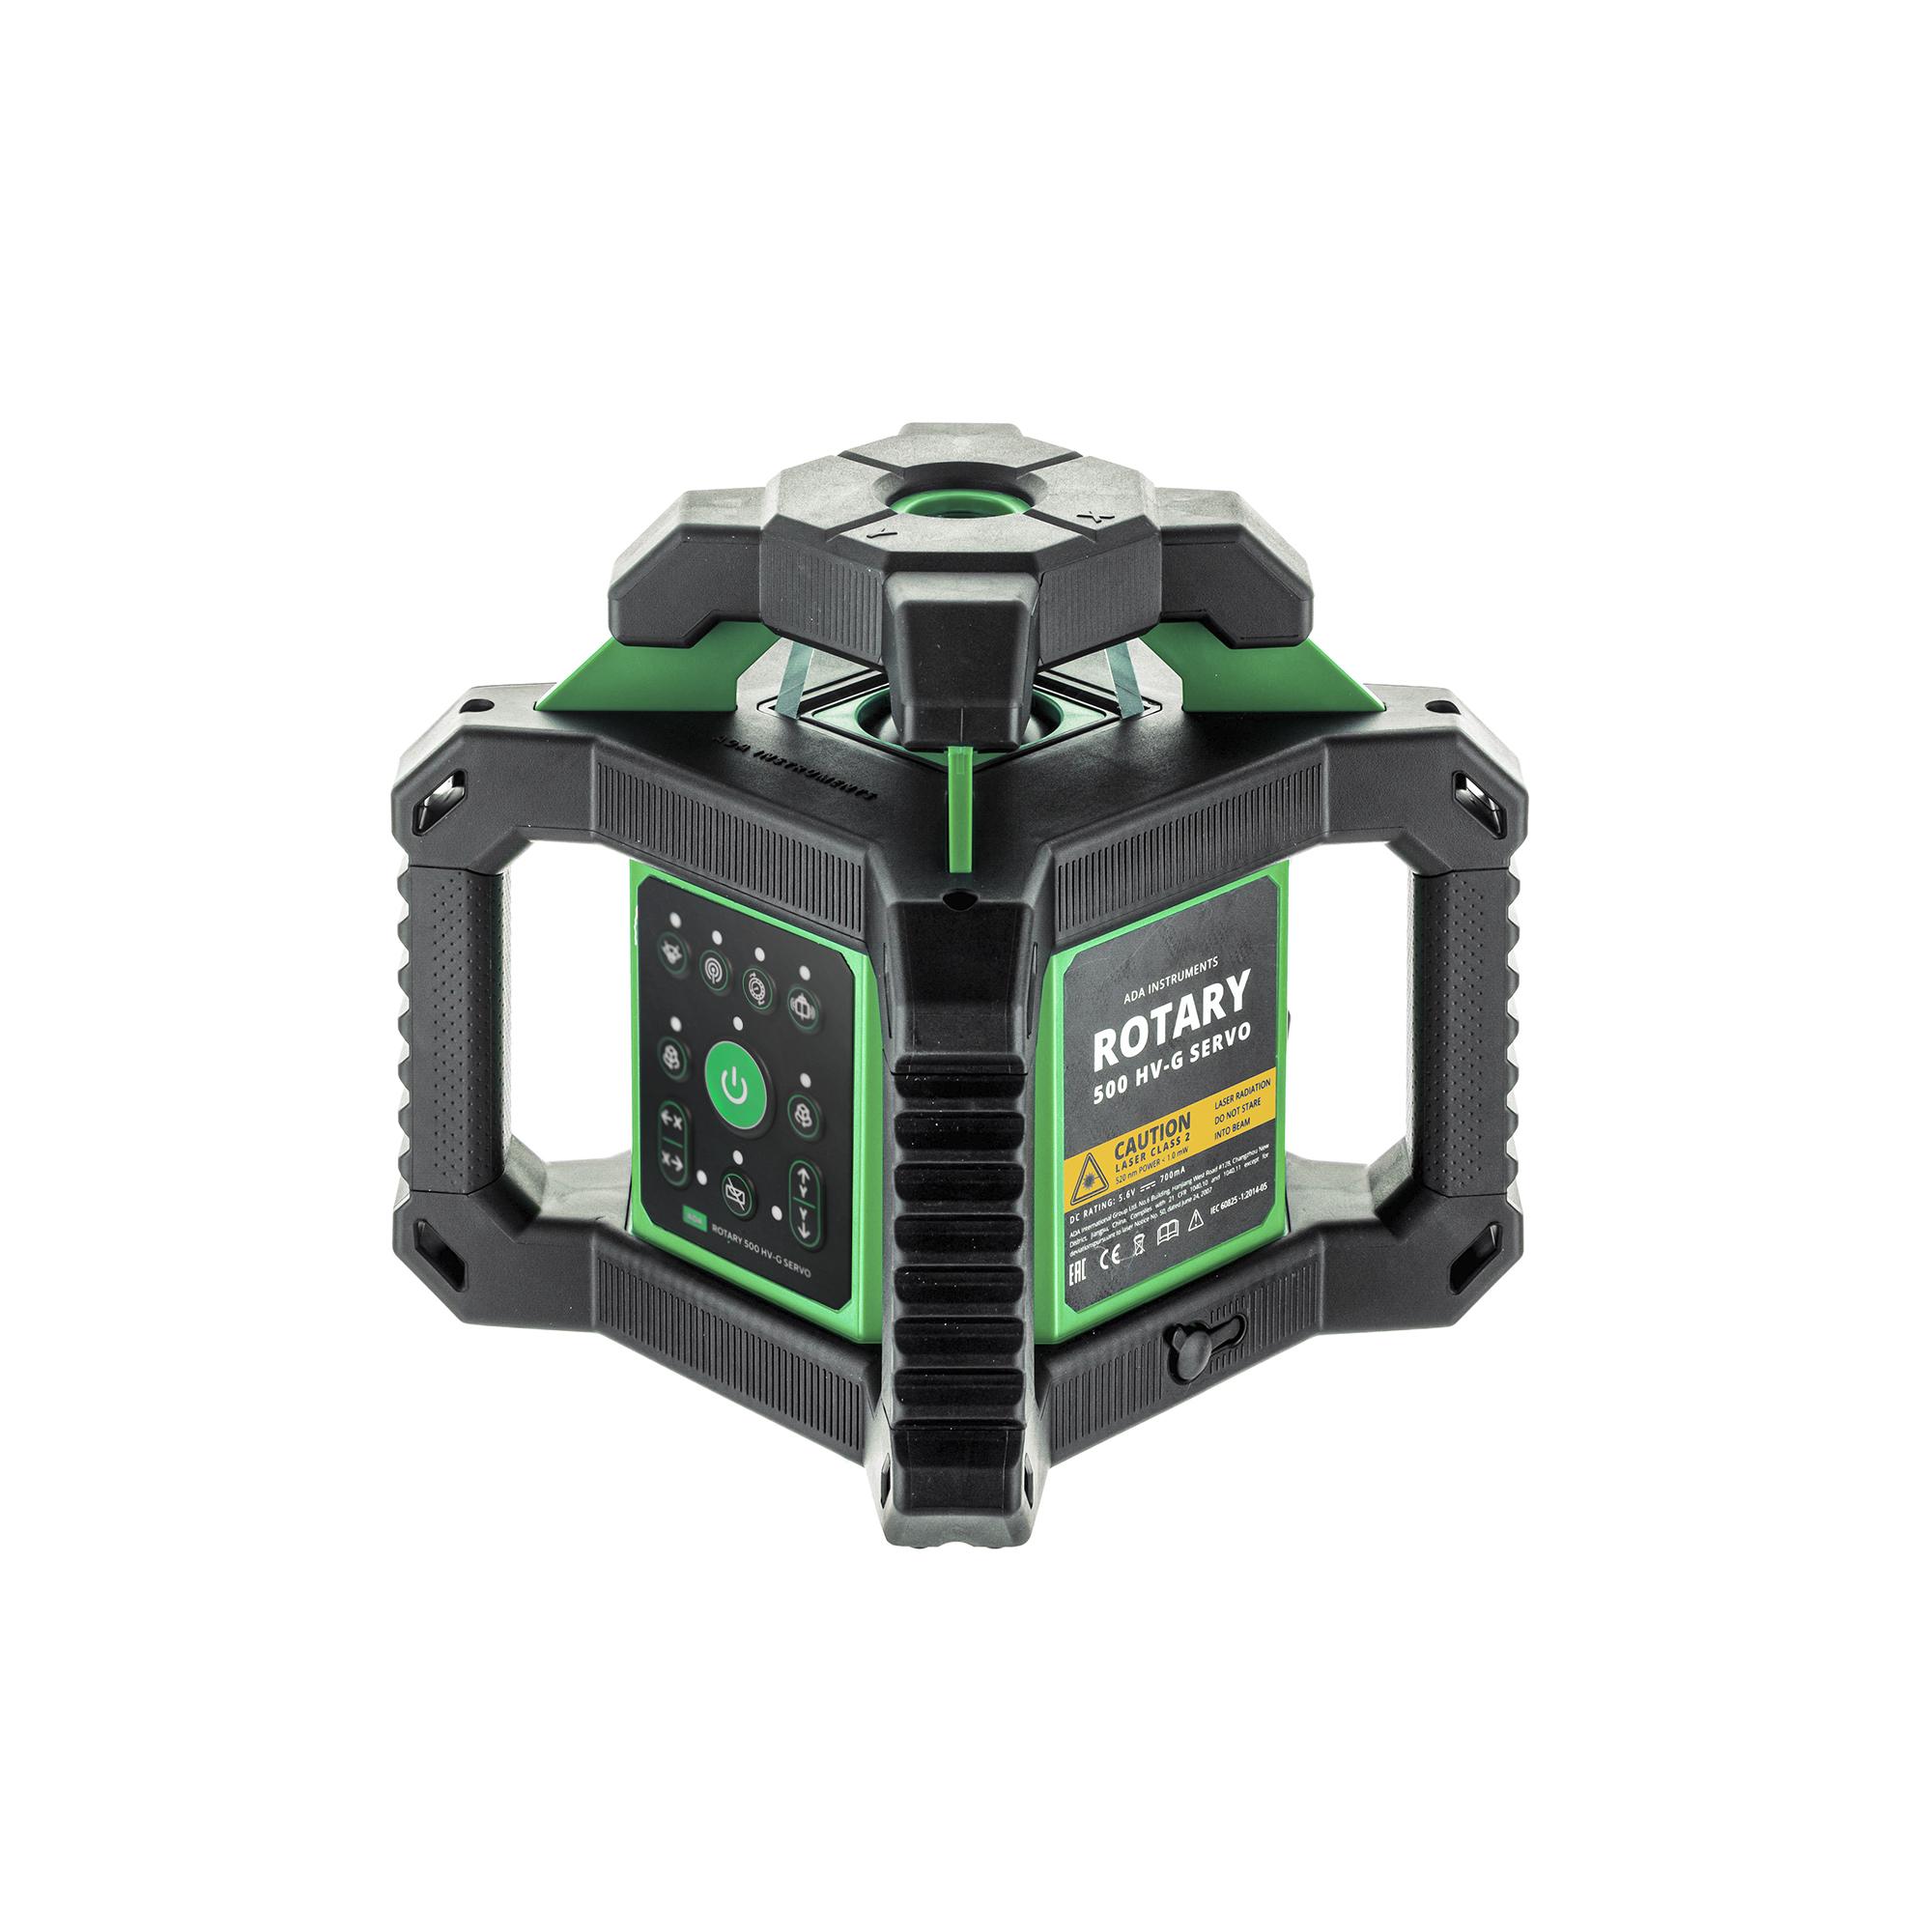 Laser level ADA ROTARY 500 HV-G Servo